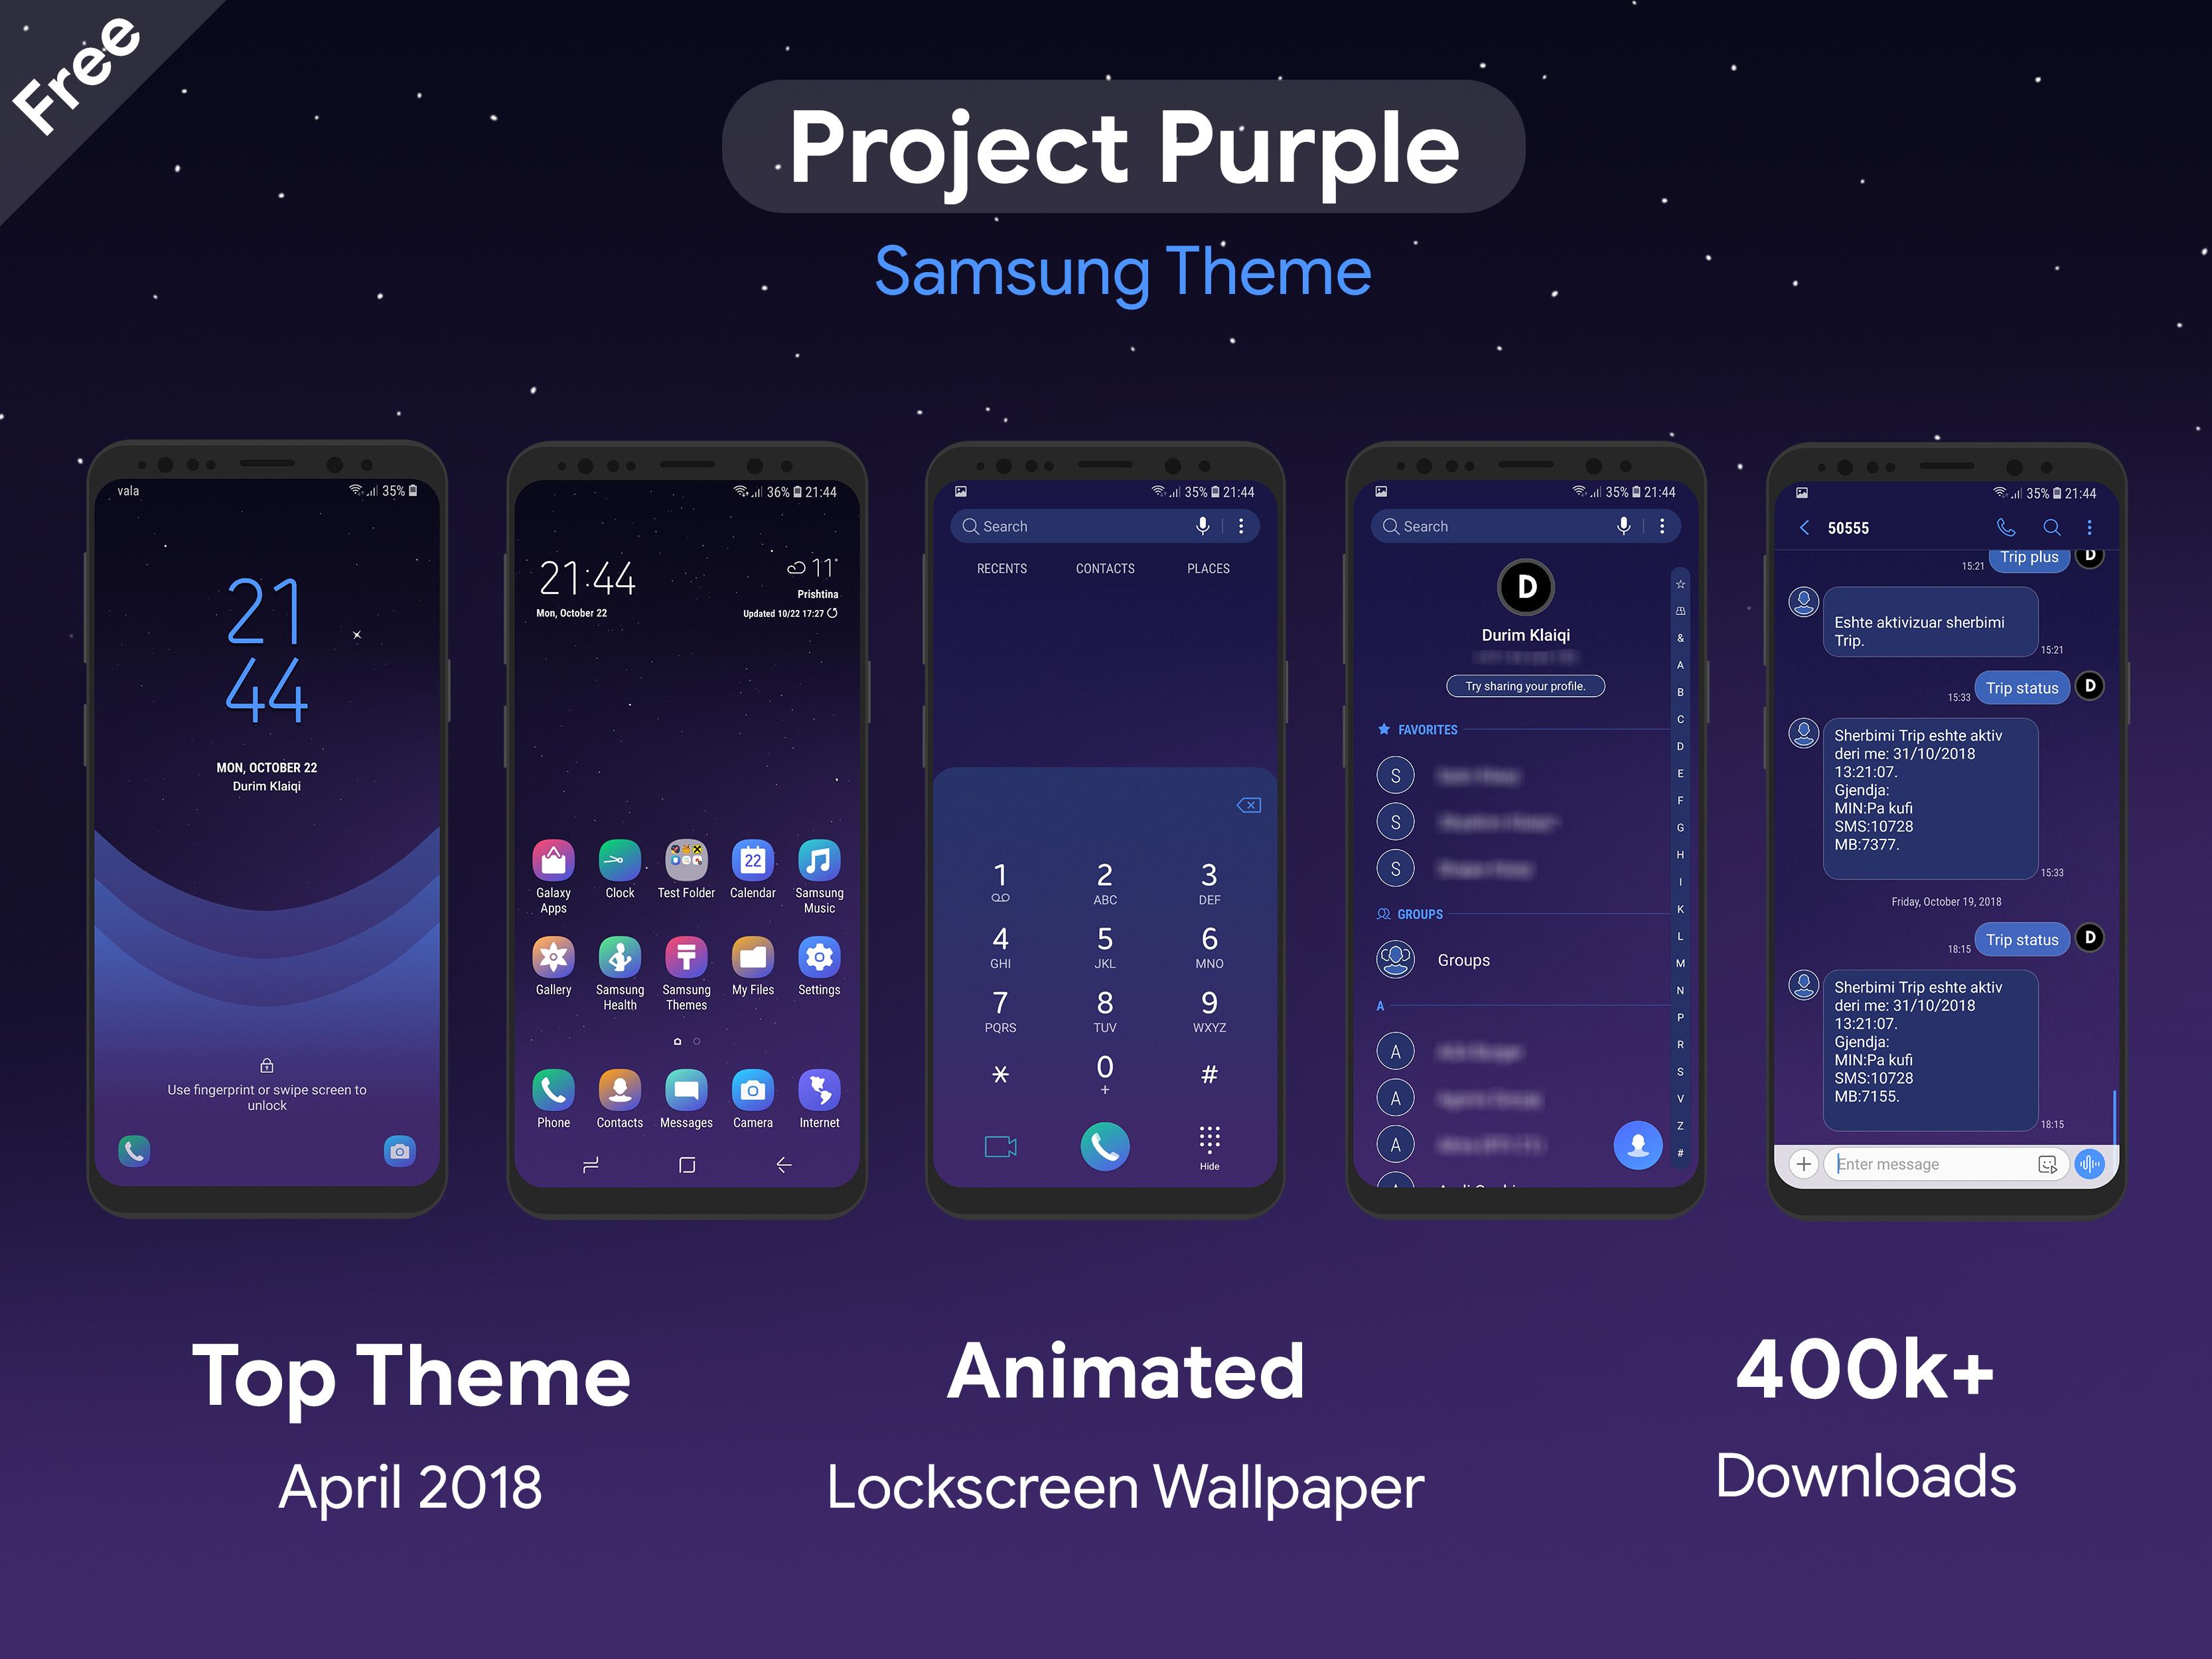 Project Purple Samsung Theme By Durim Klaiqi On Dribbble